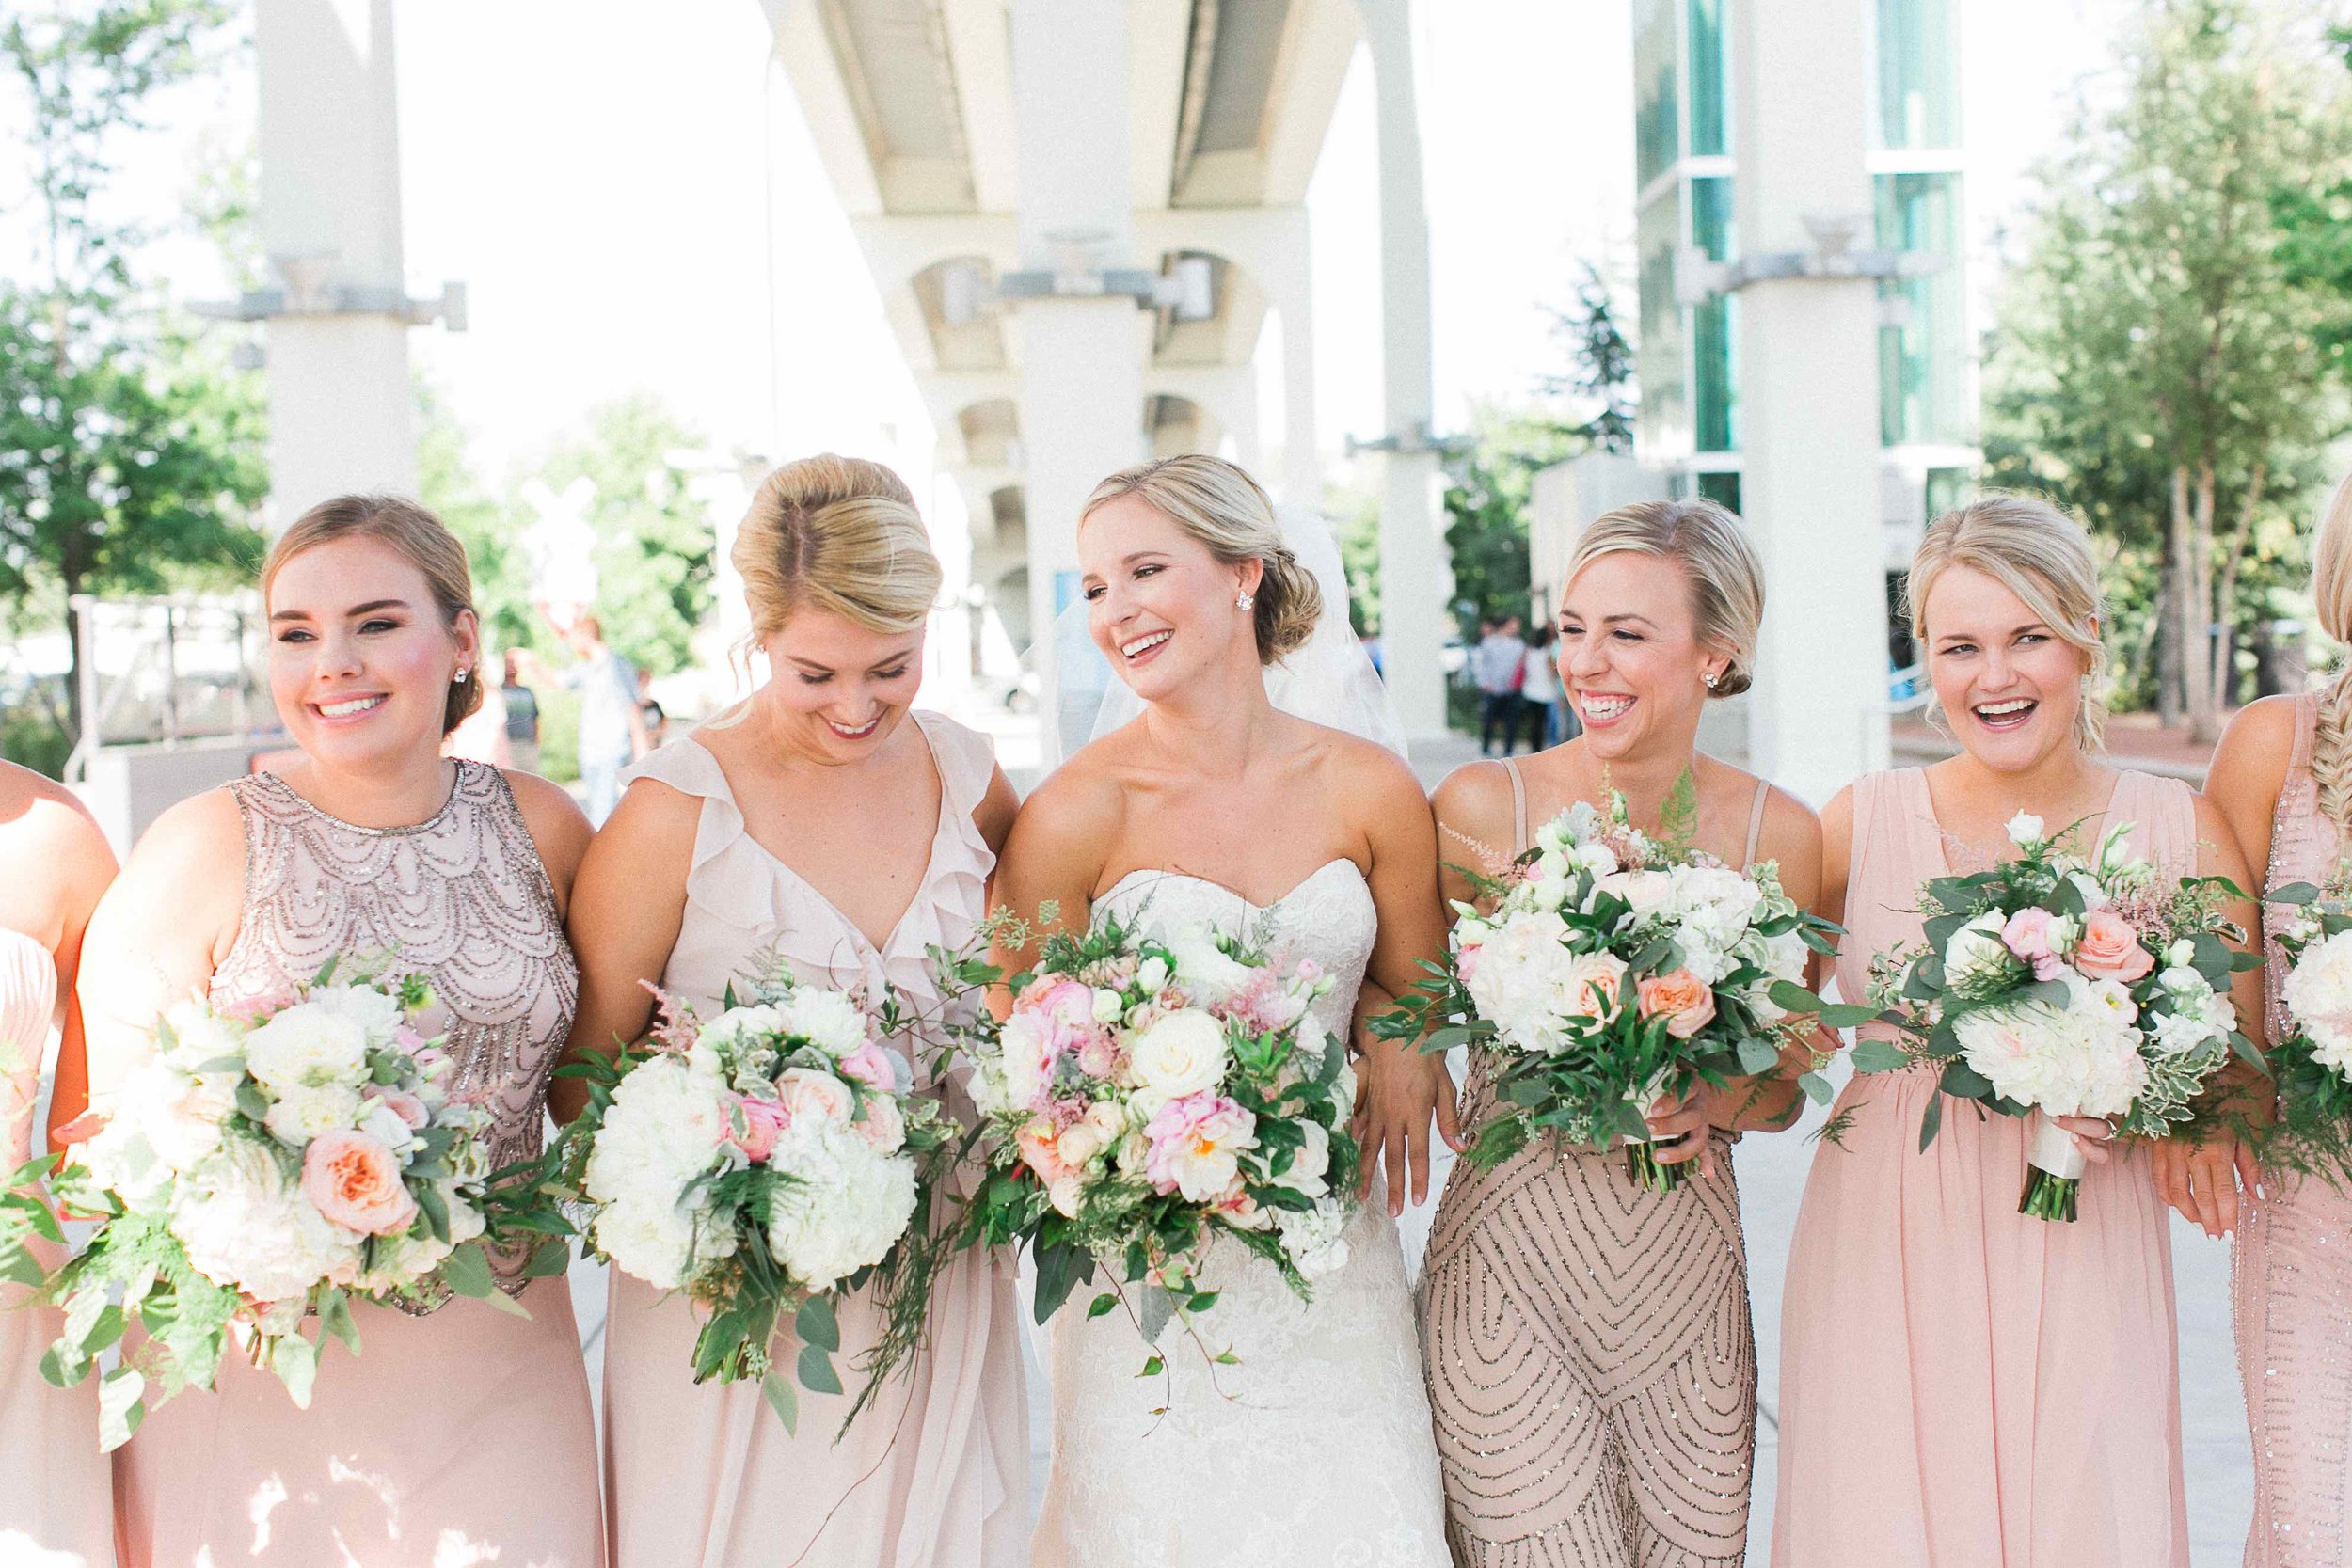 Bridesmaid medium closeup 500 res.jpg